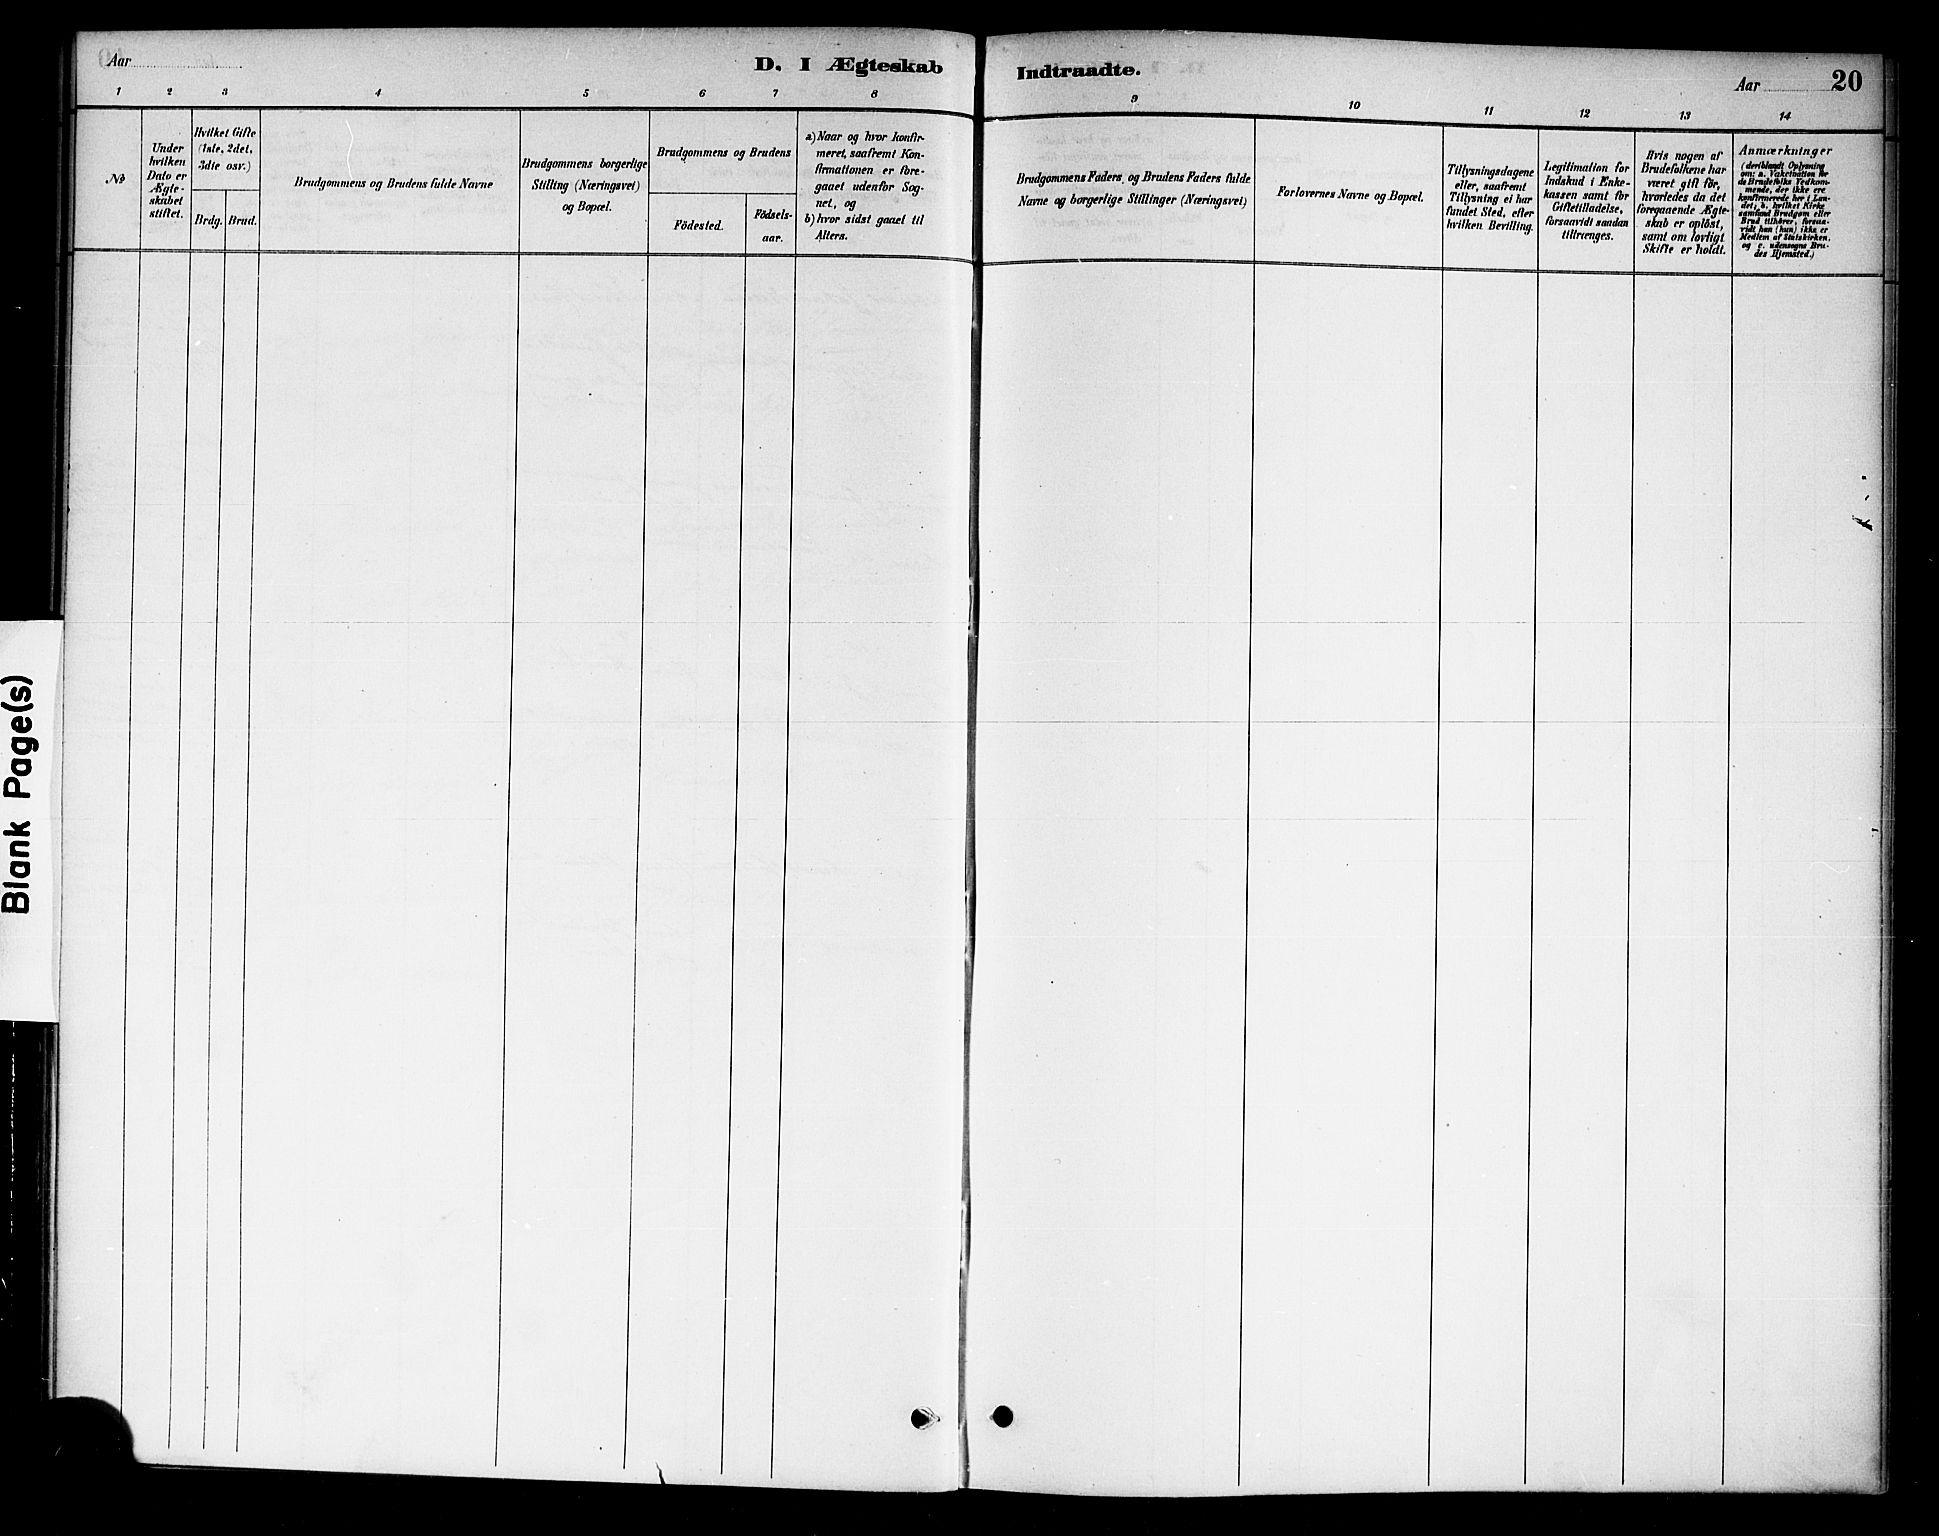 SAKO, Drangedal kirkebøker, F/Fa/L0011: Ministerialbok nr. 11 /1, 1885-1894, s. 20